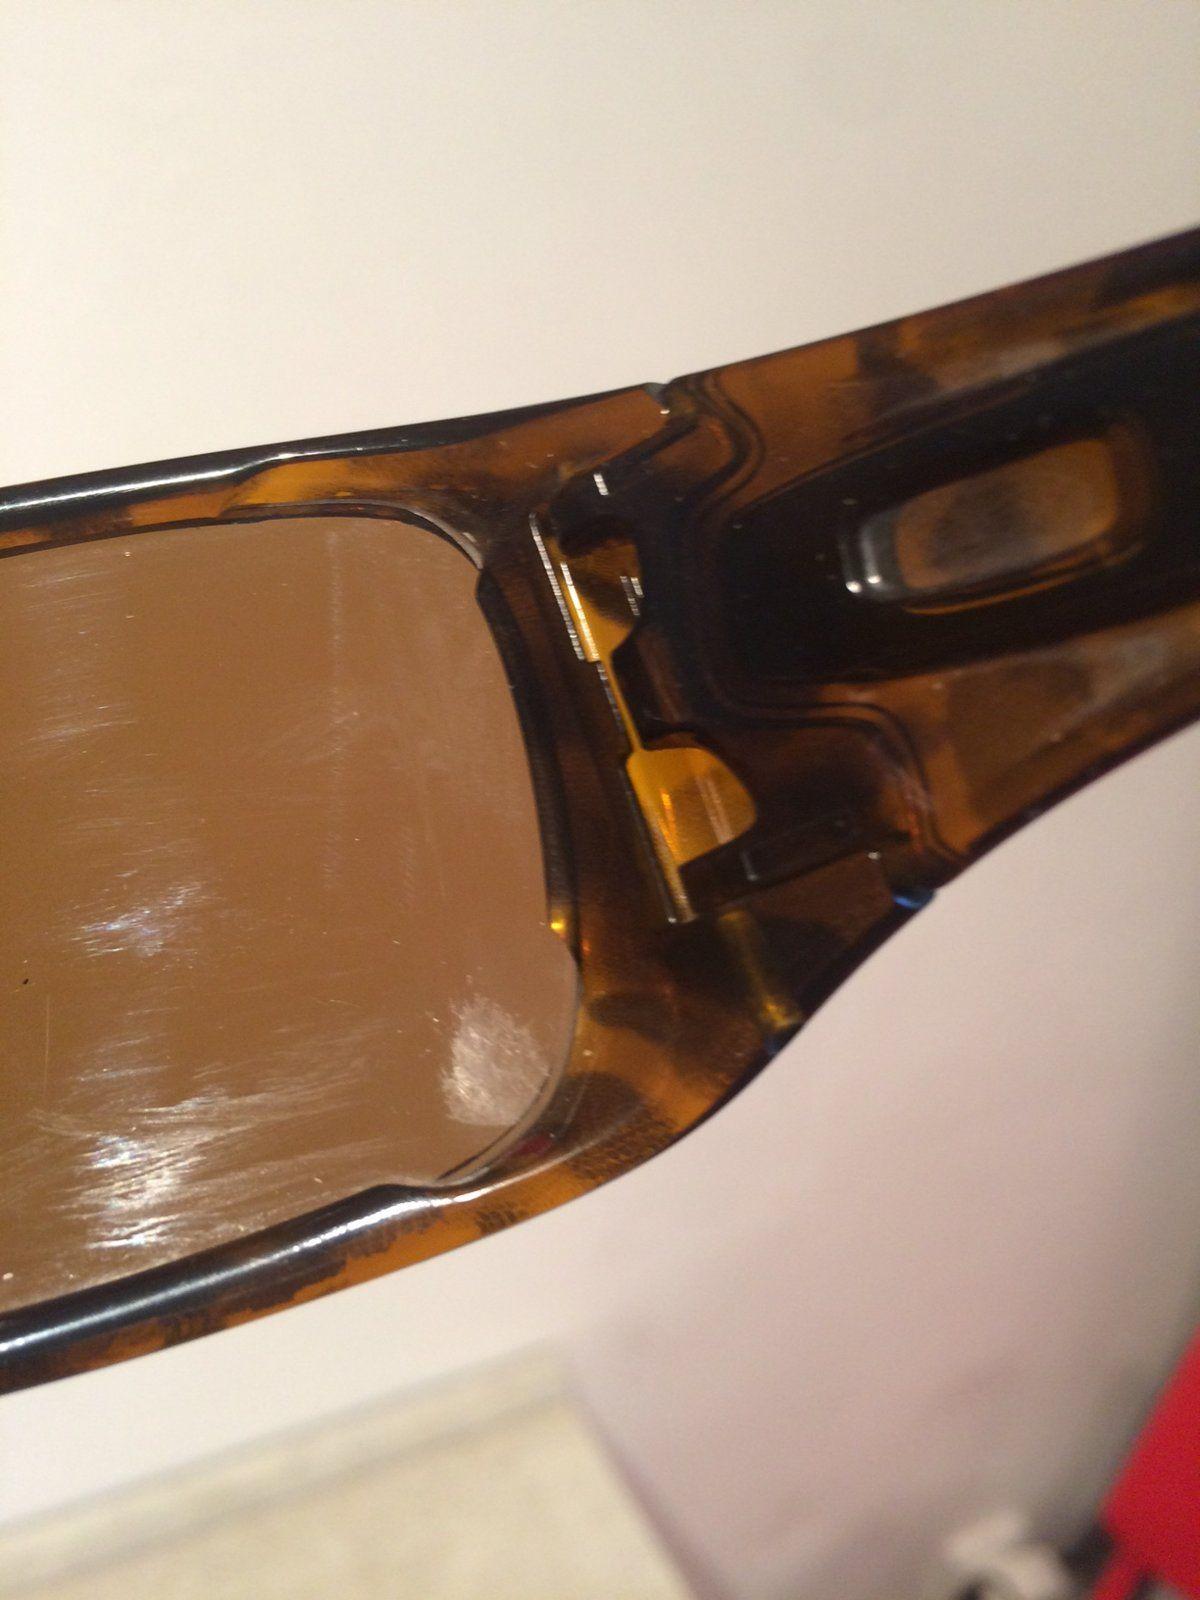 a6f4289fa8 Oakley Antix Brown Tortoise Dark Bronze Sunglasses  03-703 - IMG 6702.JPG